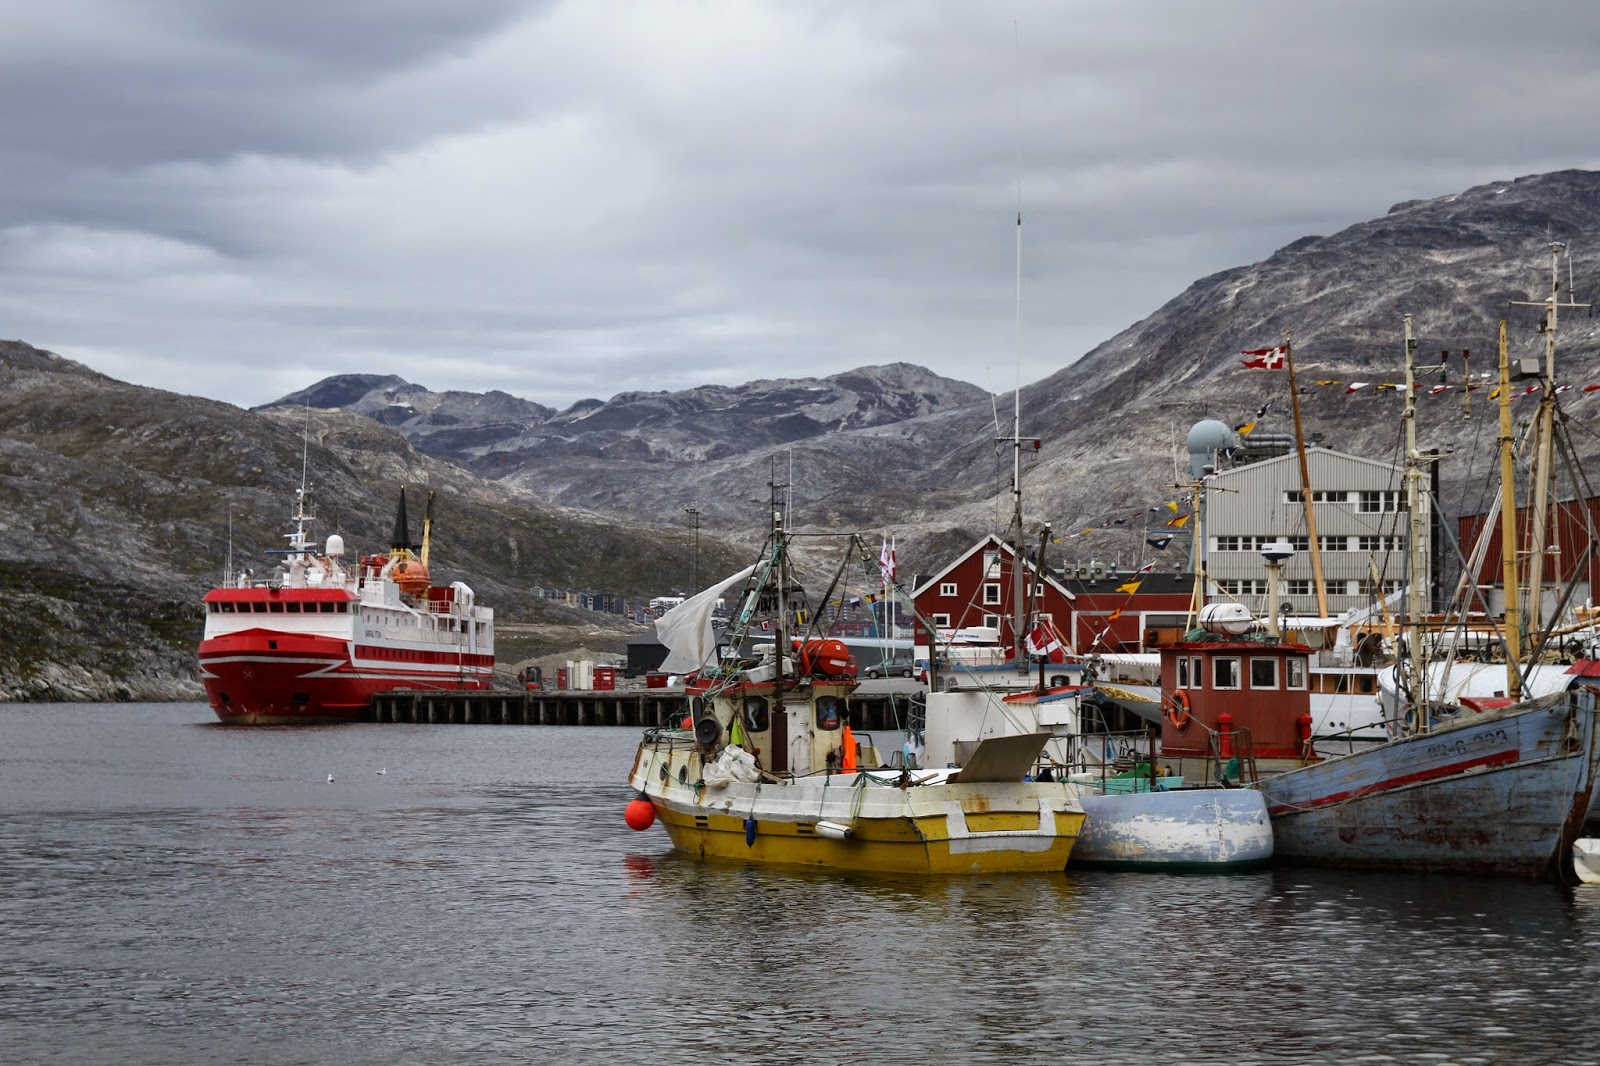 A bordo do SARFAQ ITTUK (de Nuuk a Sisimiut e Aasiaat) pela costa oeste da Gronelândia a bordo - Parte II | Gronelândia